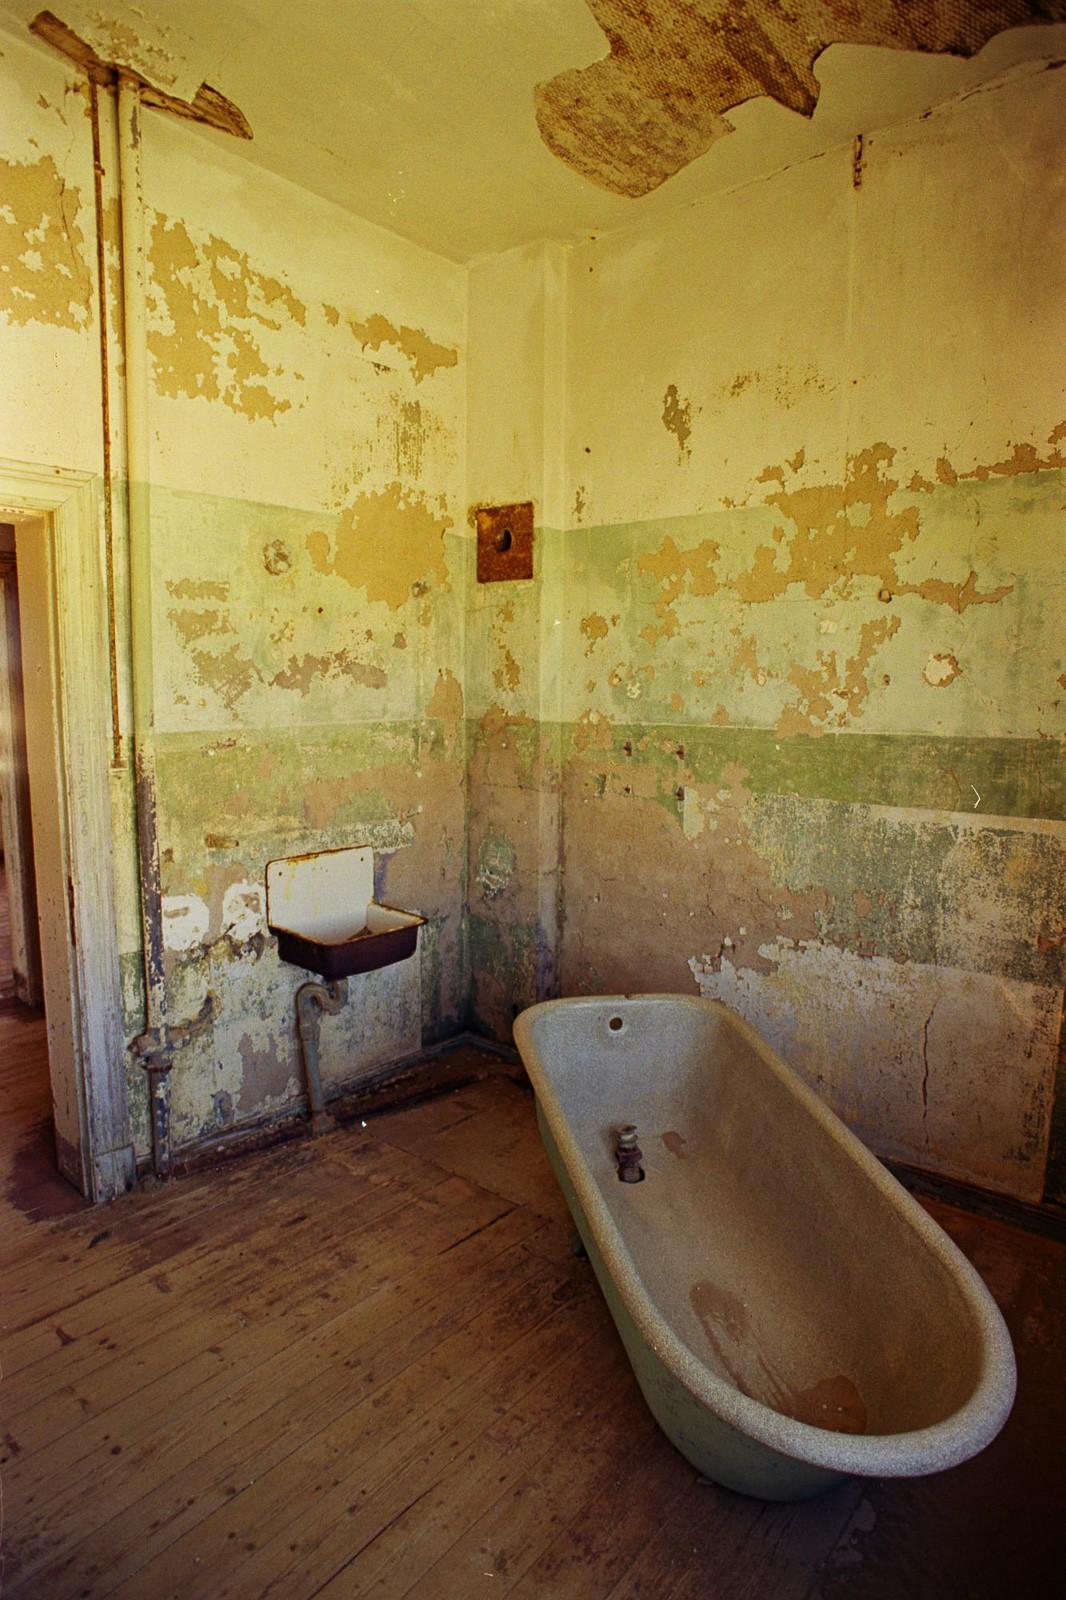 namibia desert ghost town diamond mine kolmanskop old bathtub